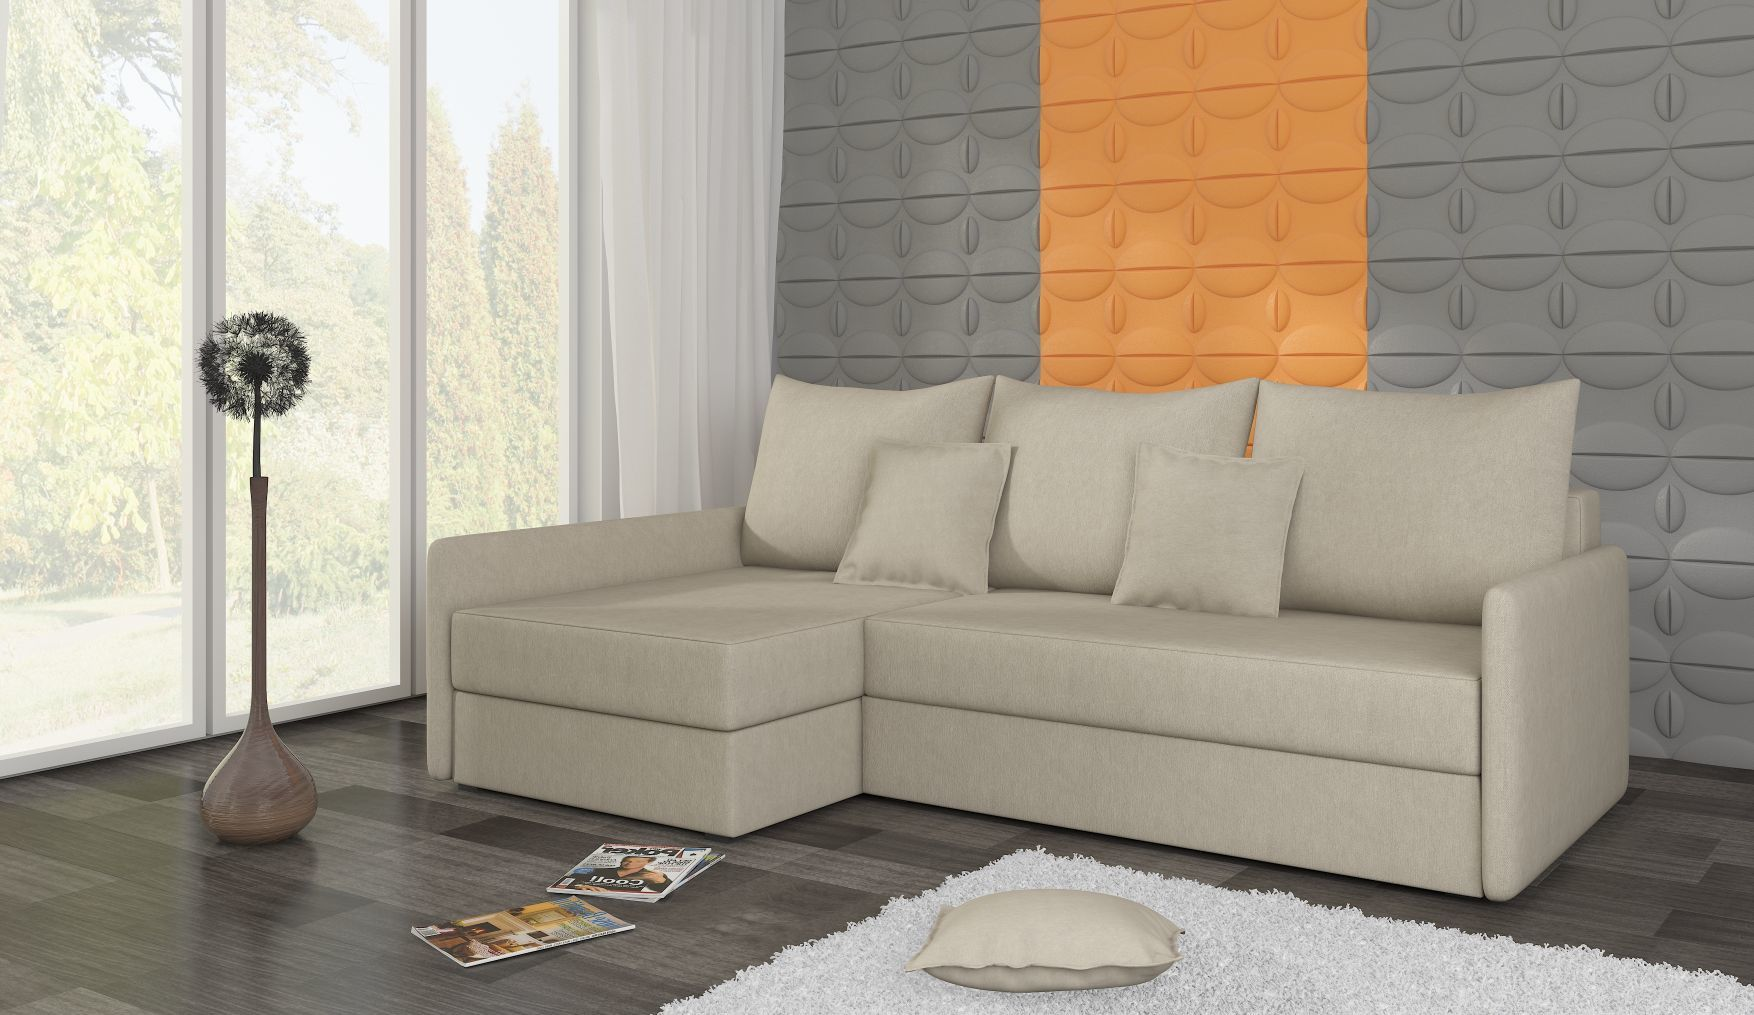 Rogówka ARKADIA 2 ST funkcja spania kanapa łóżko